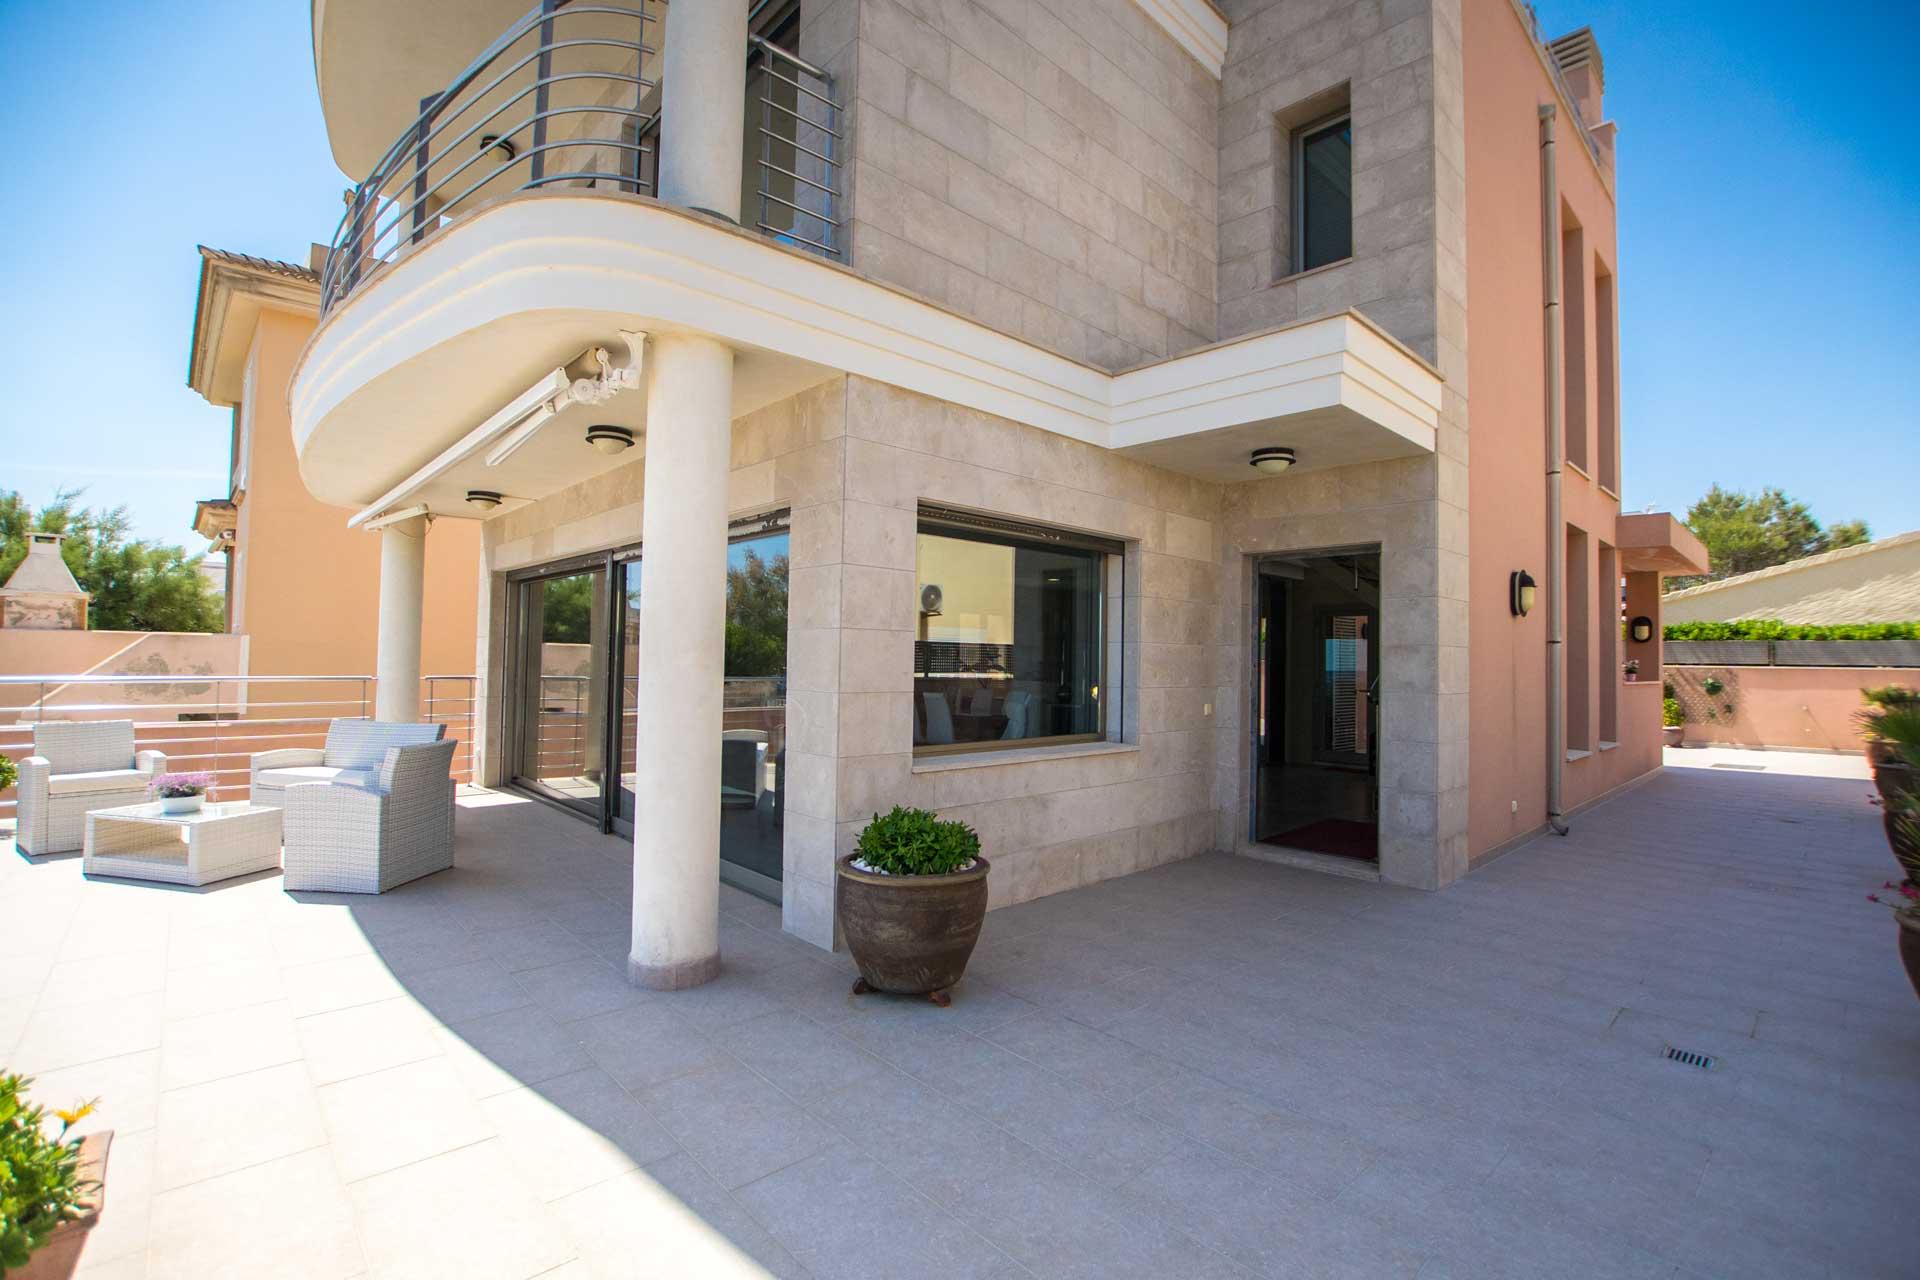 Villa Bohemi P. - Terrace in front of the house